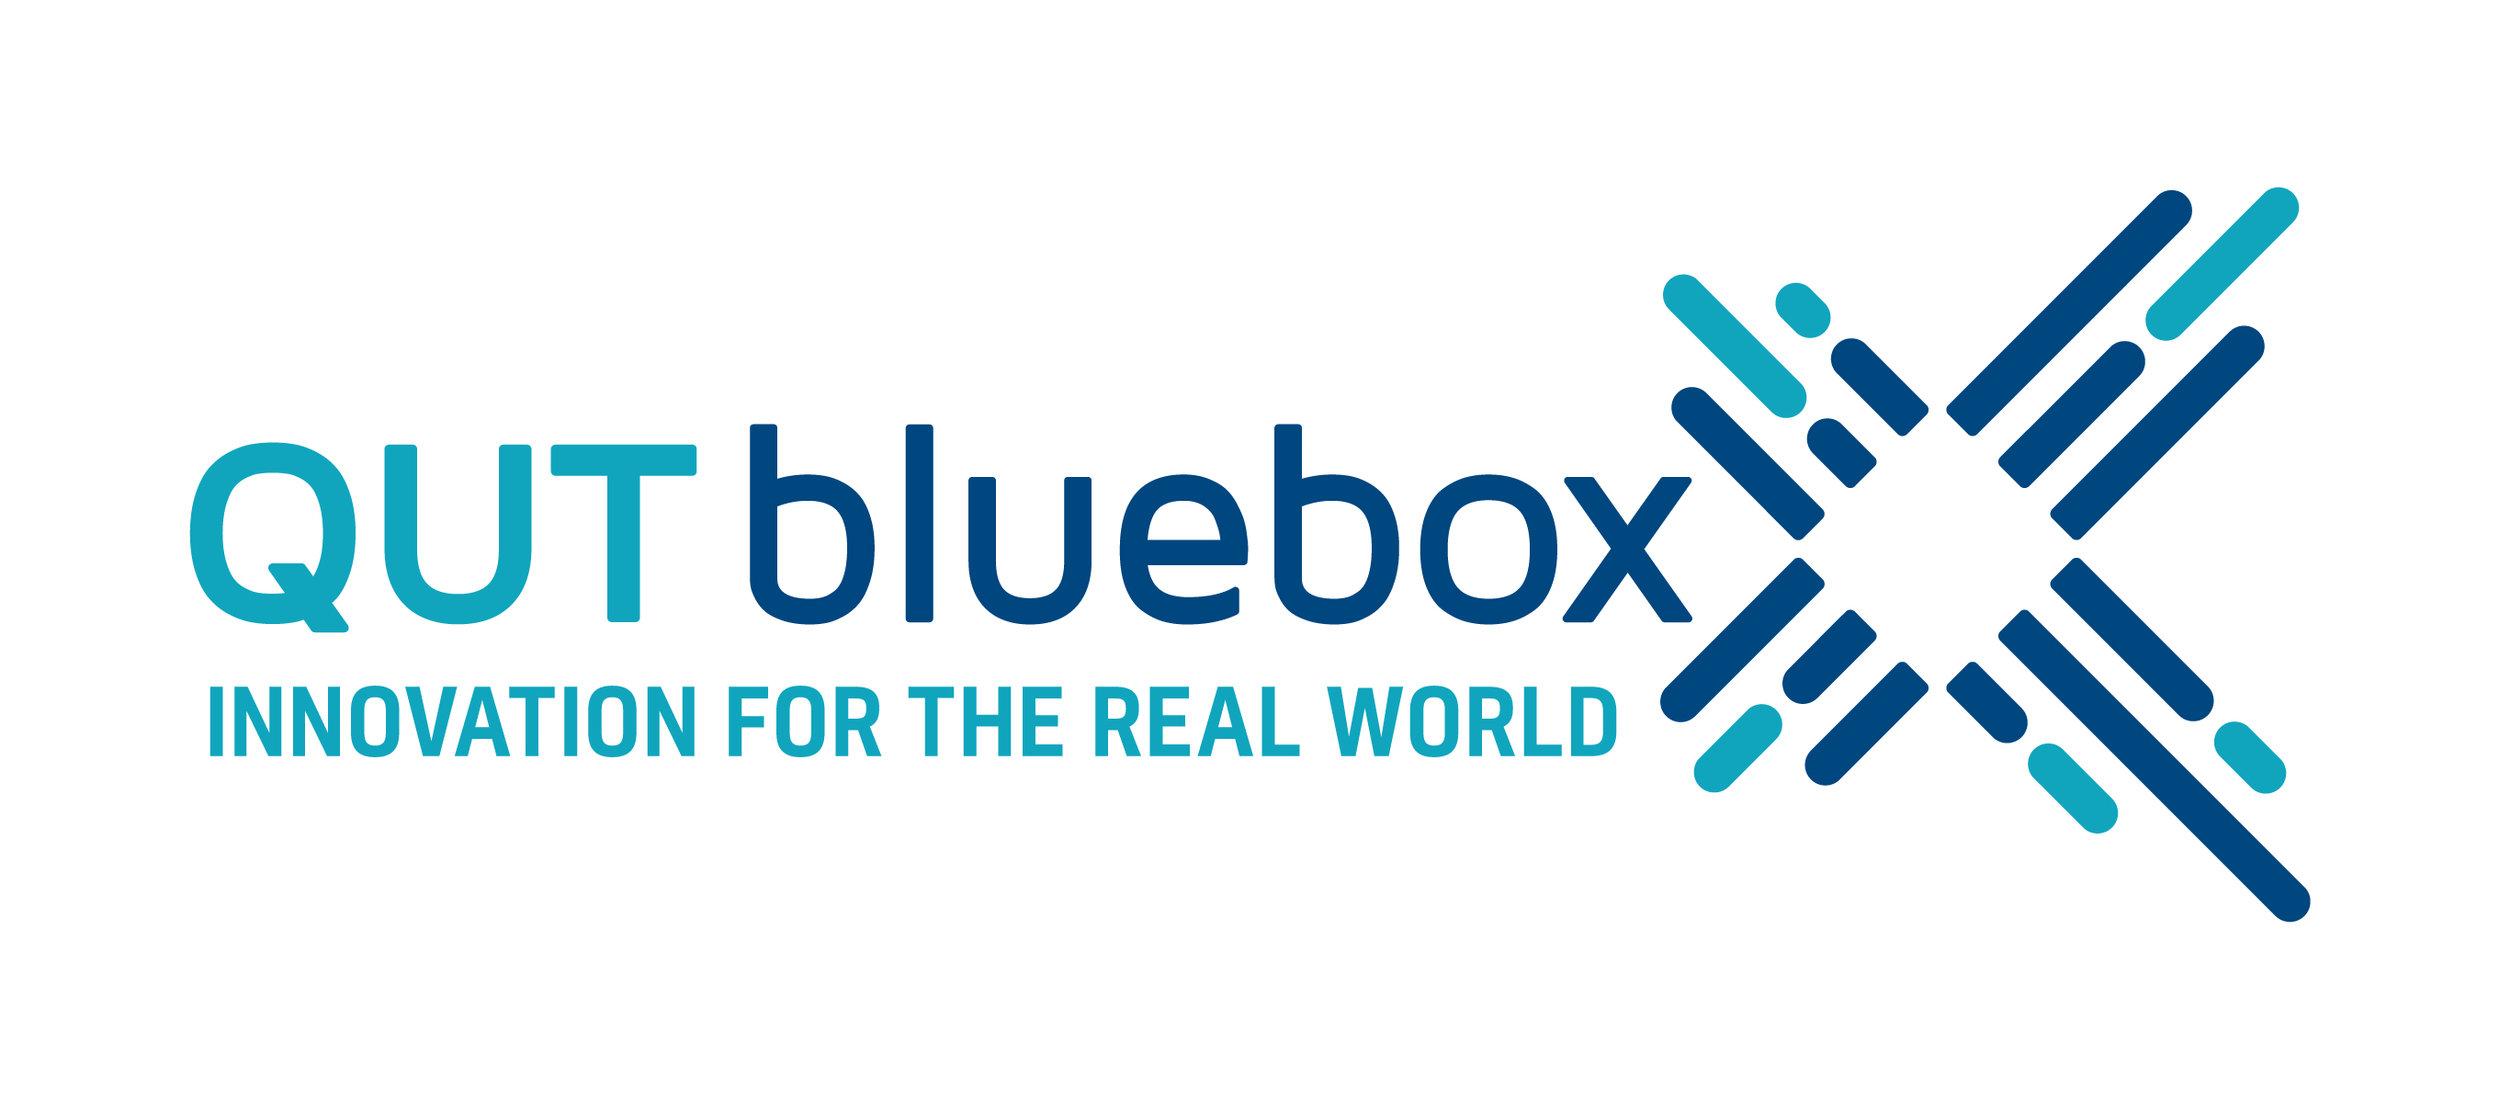 qut_bluebox_logo.jpg